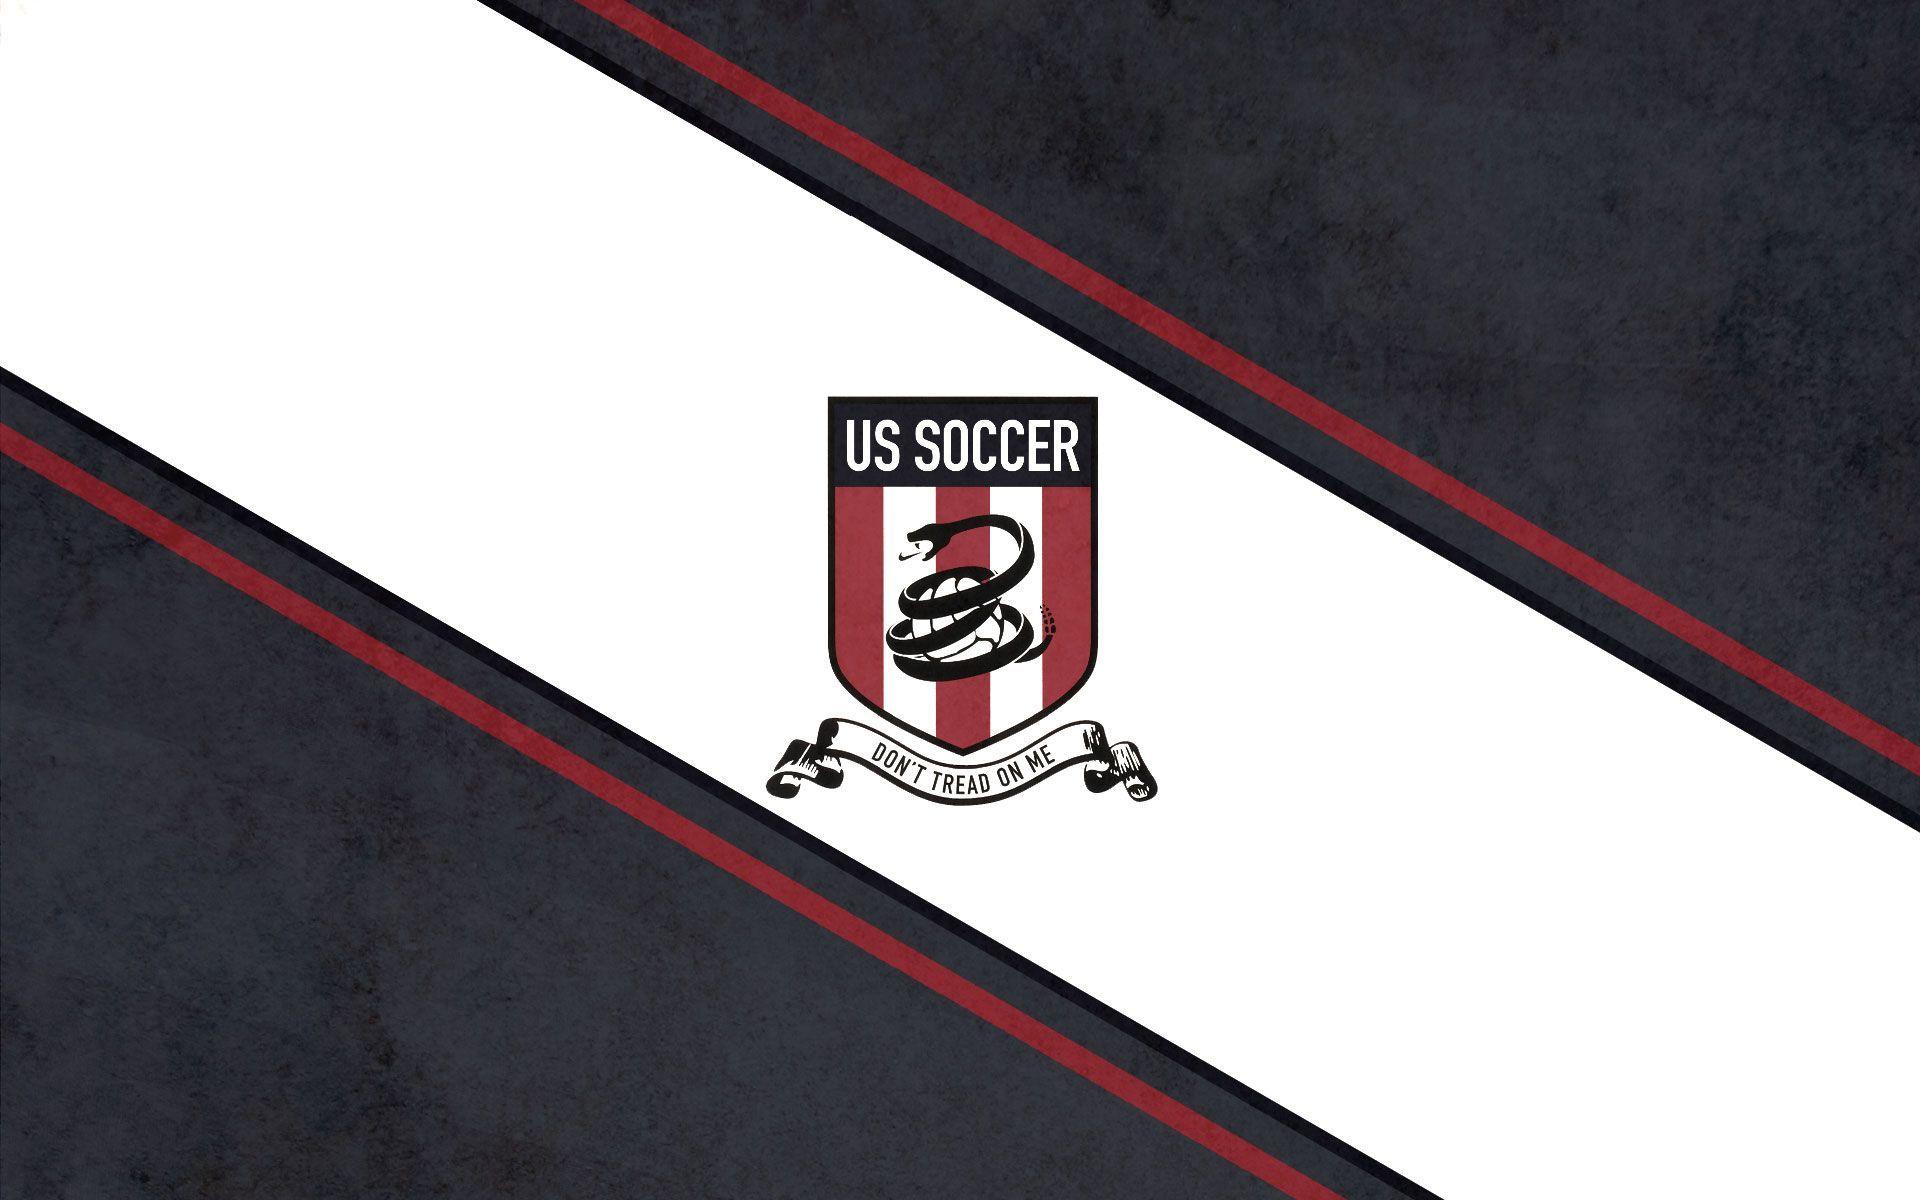 2015 Usmnt Wallpapers  USA Logos Soccer 1920x1200